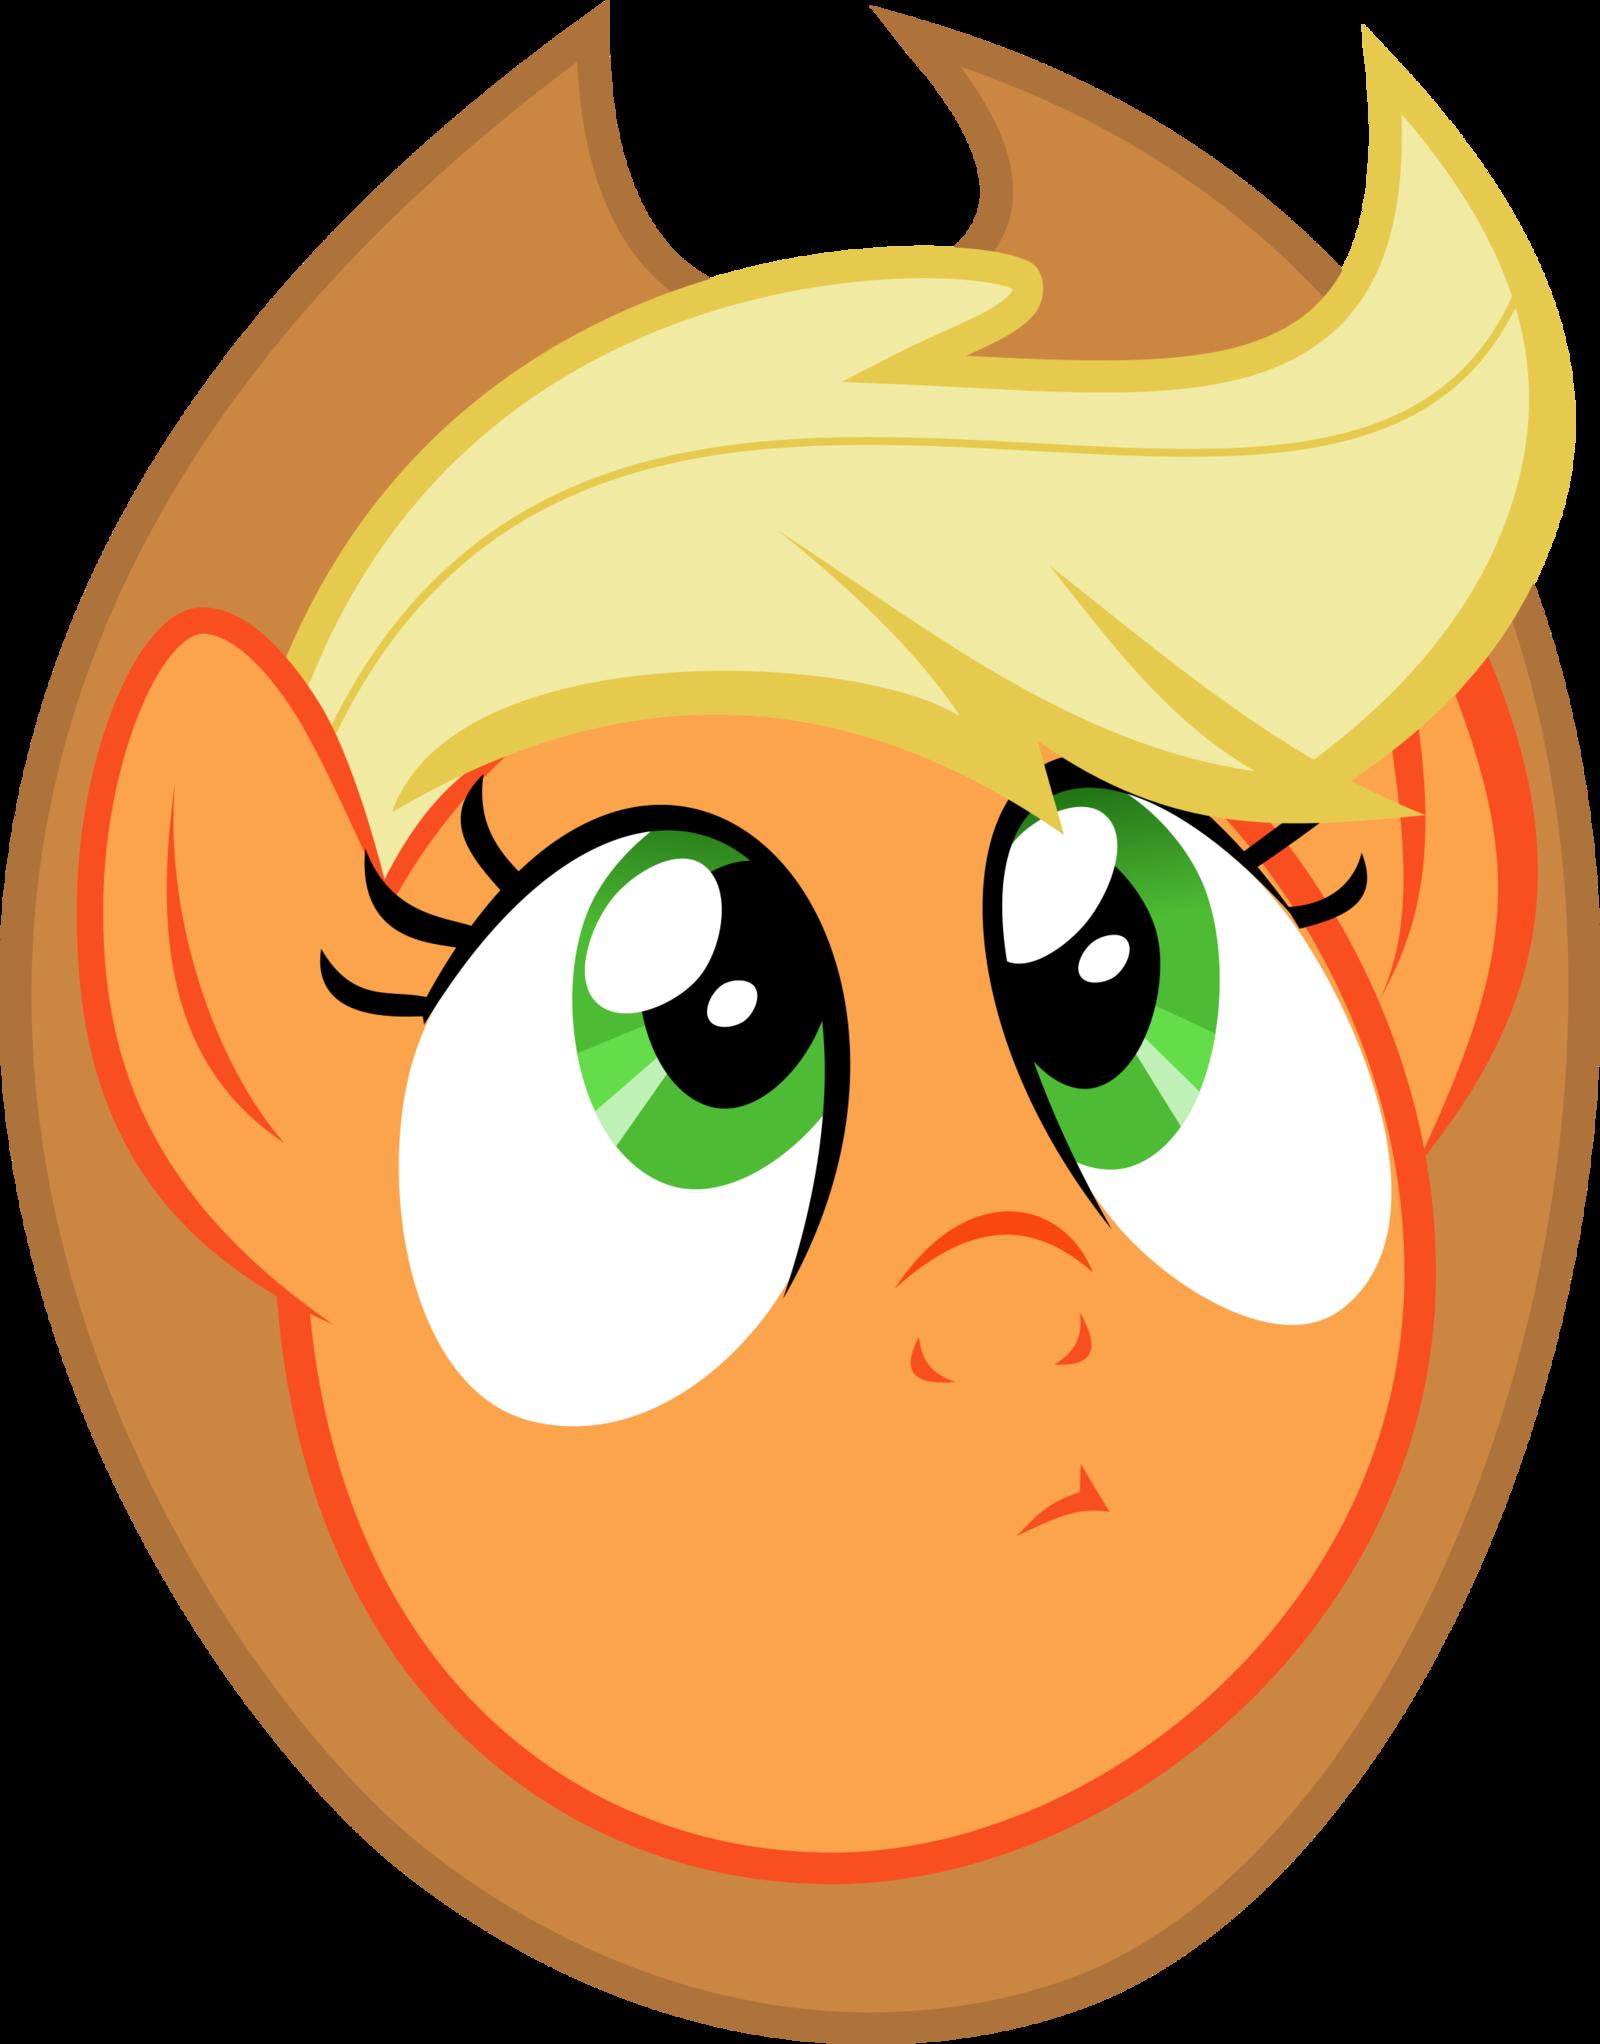 Applejack thoughtful face by xbi on DeviantArt.